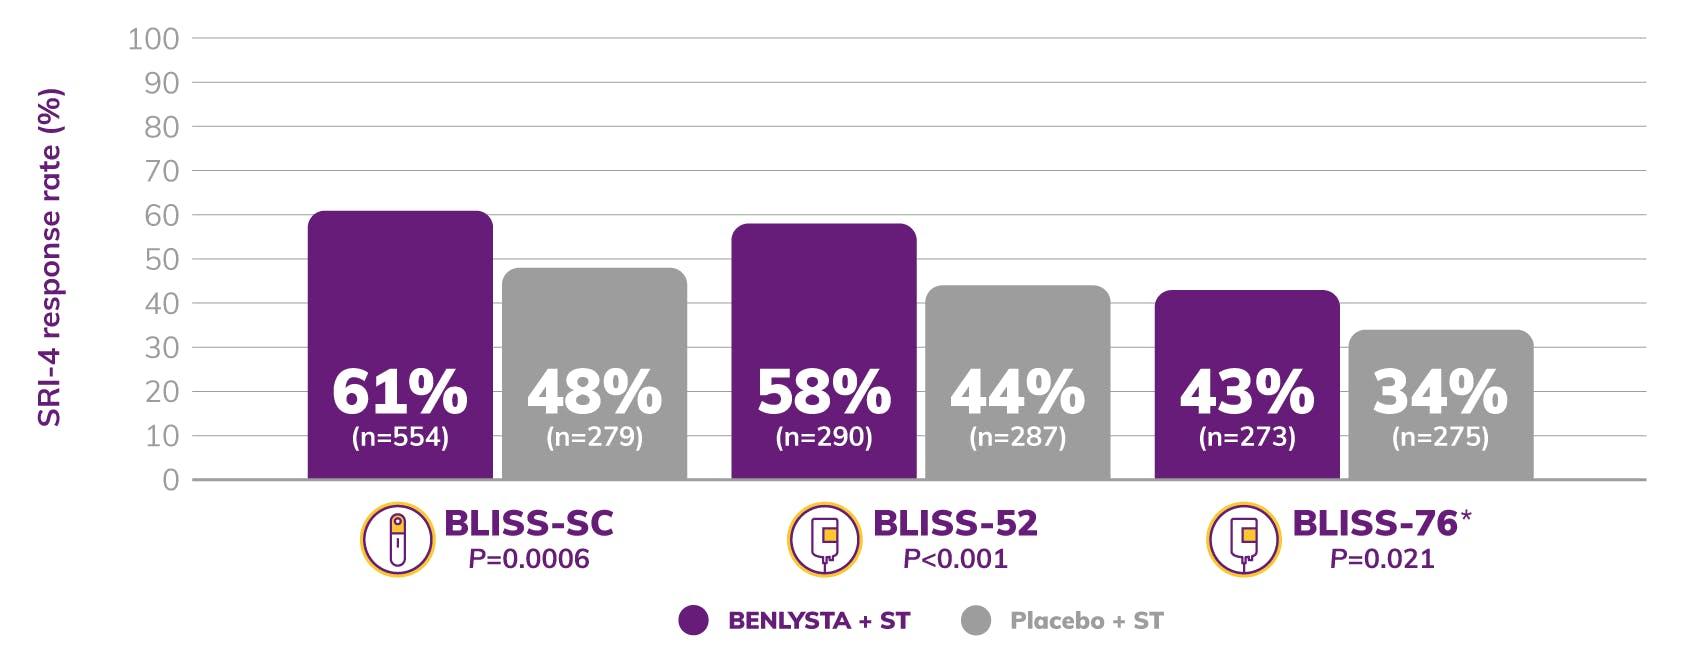 Graph: BLISS-SC SRI-4 Response Rate Shows 61% BENLYSTA + ST and 48% Placebo + ST.  BLISS-52 SRI-4 Response Rate Shows 58% BENLYSTA + ST and 44% Placebo + ST. BLISS-76 SRI-4 Response Rate Shows 43% BENLYSTA + ST and 34% Placebo + ST